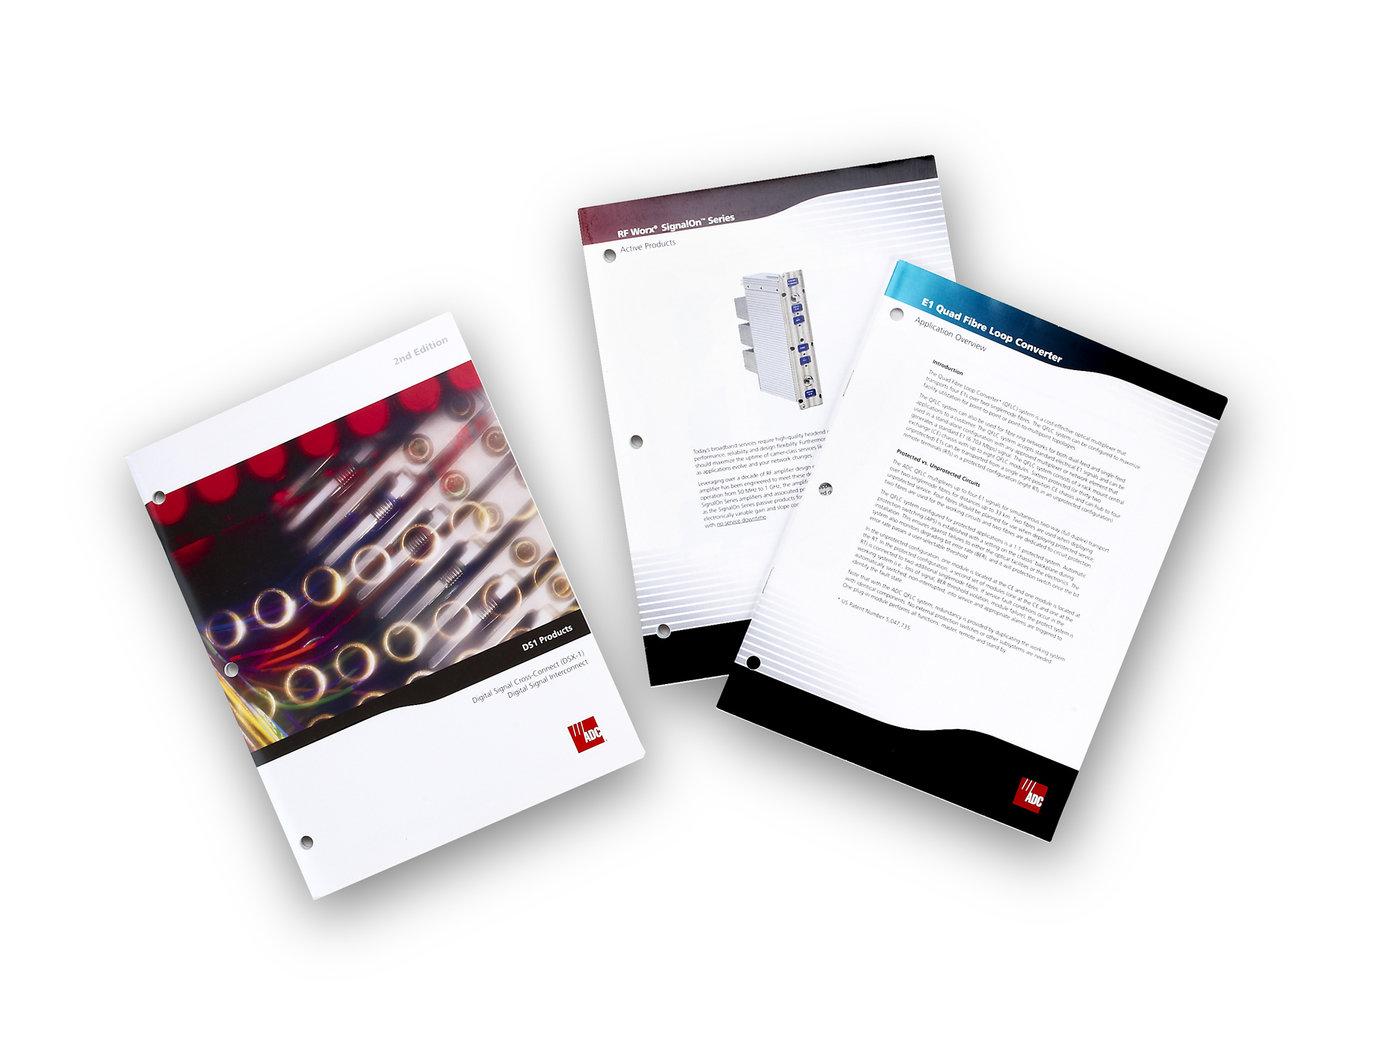 Catalog Work by Kathie Haugan at Coroflot com